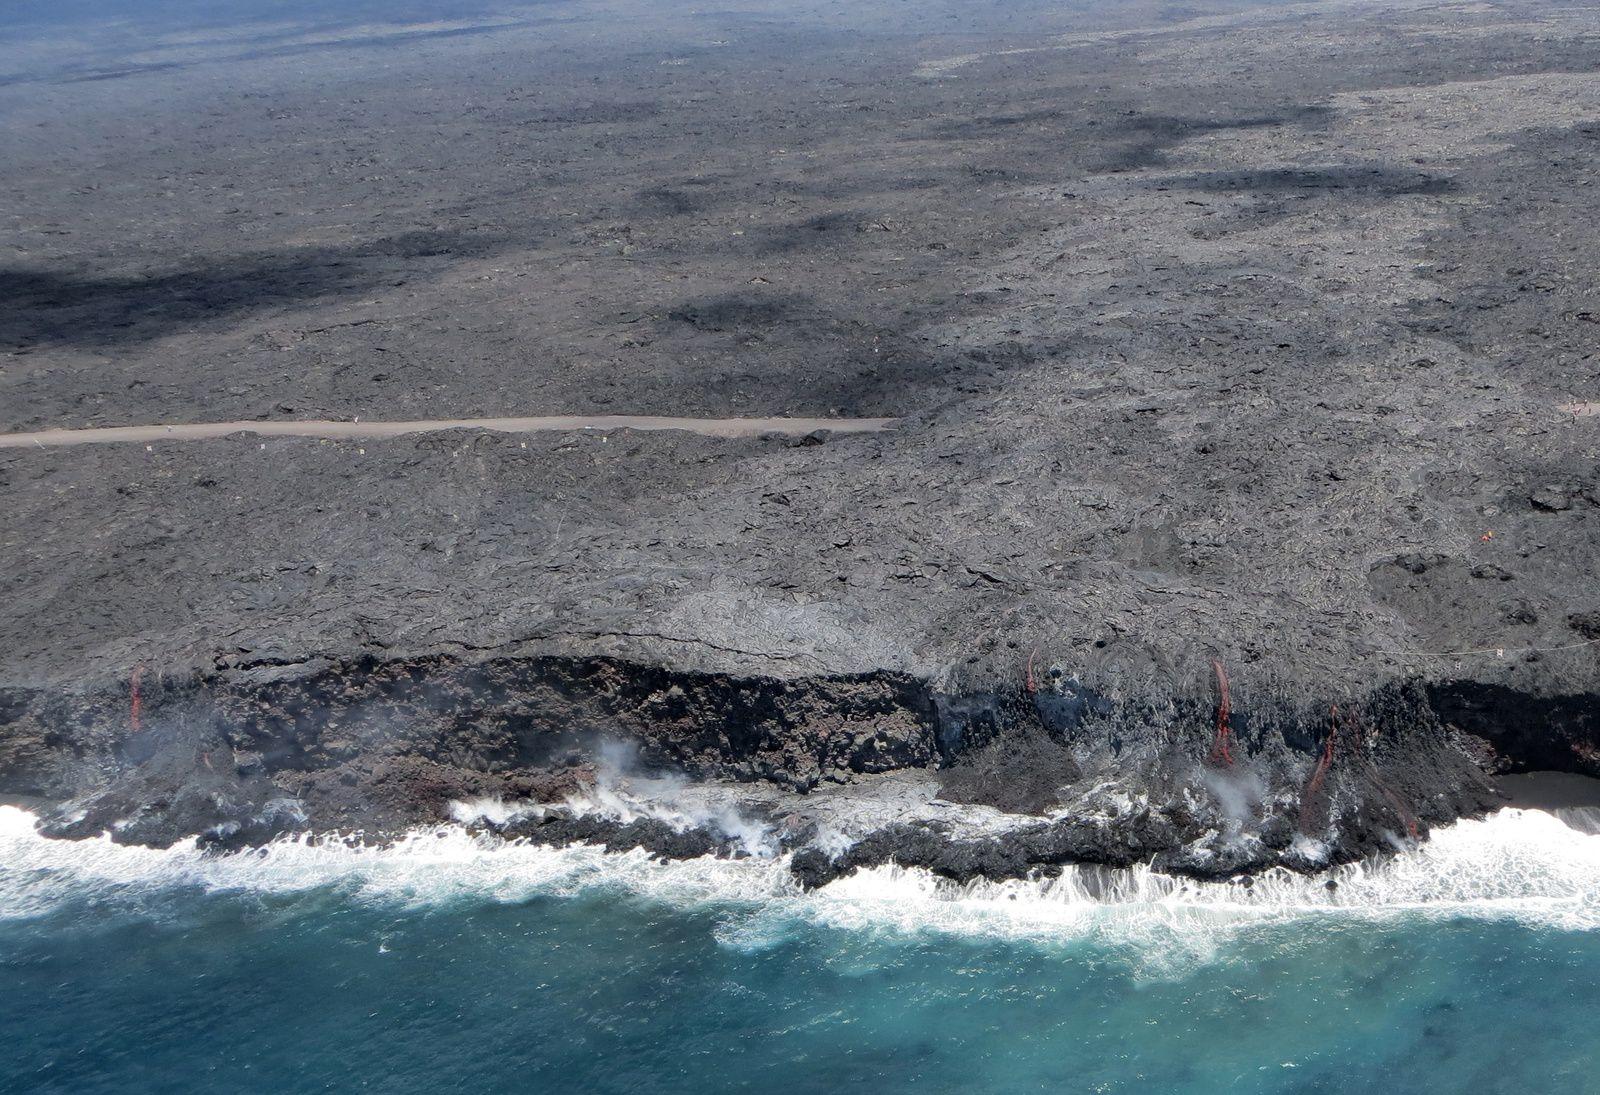 Hawaii / Pu'u O'o - two sea entrances of the lava flow 61G - close up of a photo HVO / USGS